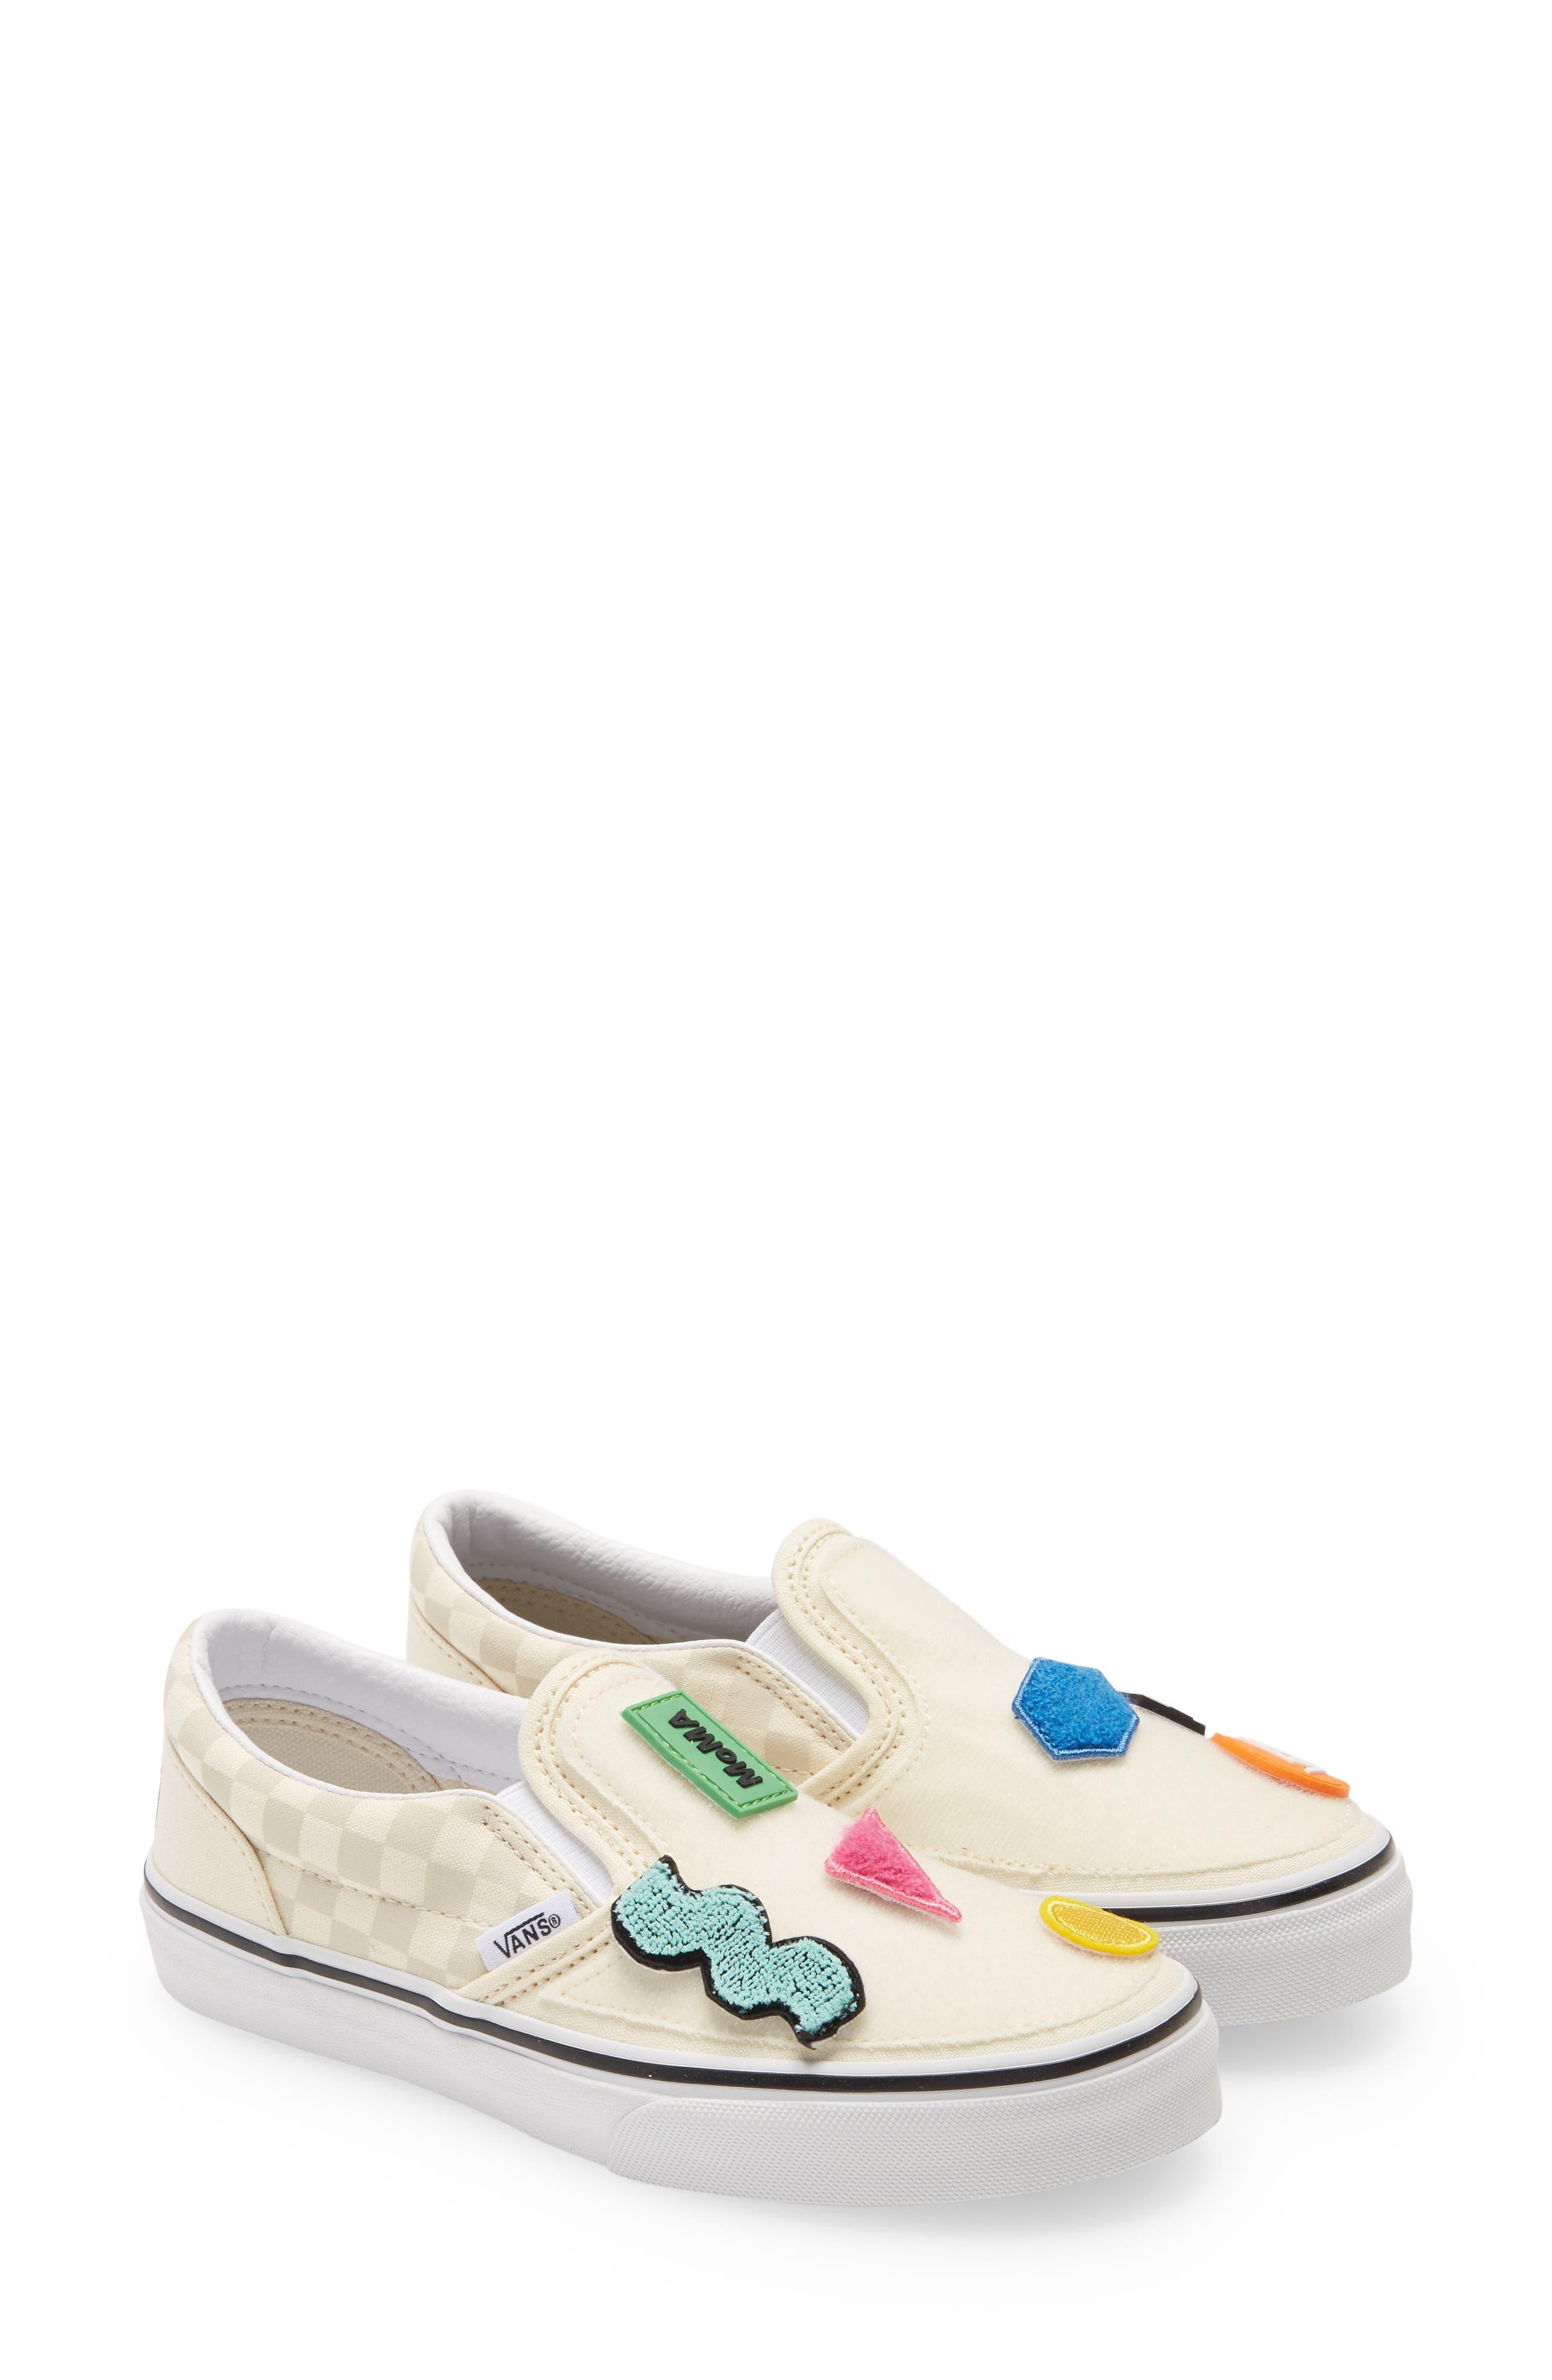 big kids slip on shoes